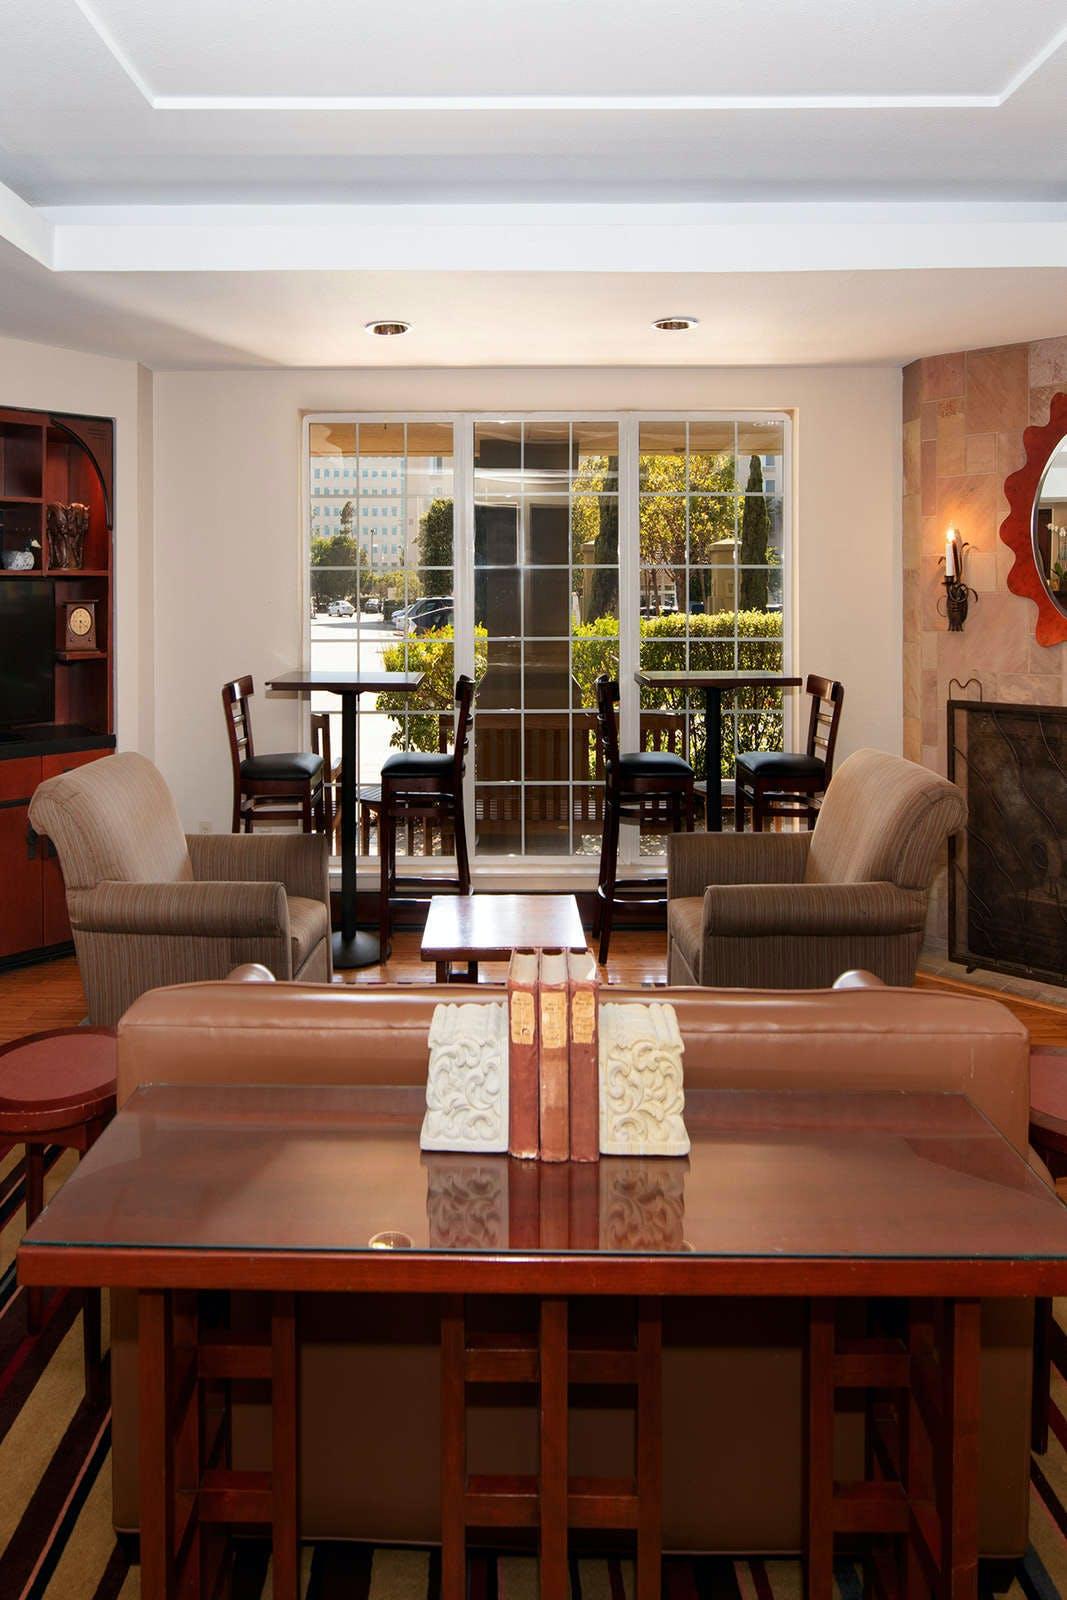 Larkspur Landing Sunnyvale - An All-Suite Hotel